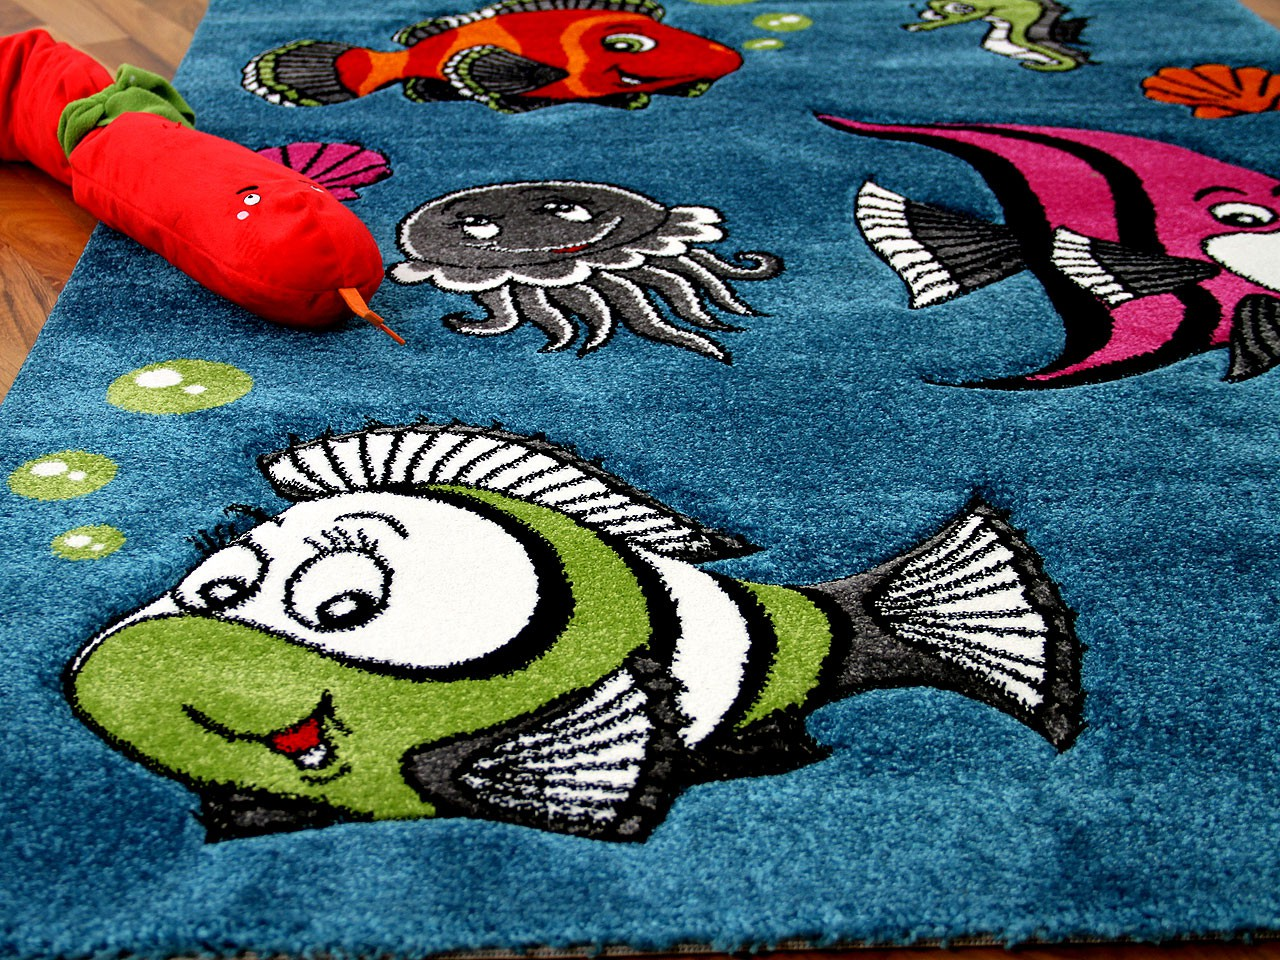 kinder teppich maui kids fische teppiche kinder und spielteppiche maui kinderteppiche. Black Bedroom Furniture Sets. Home Design Ideas